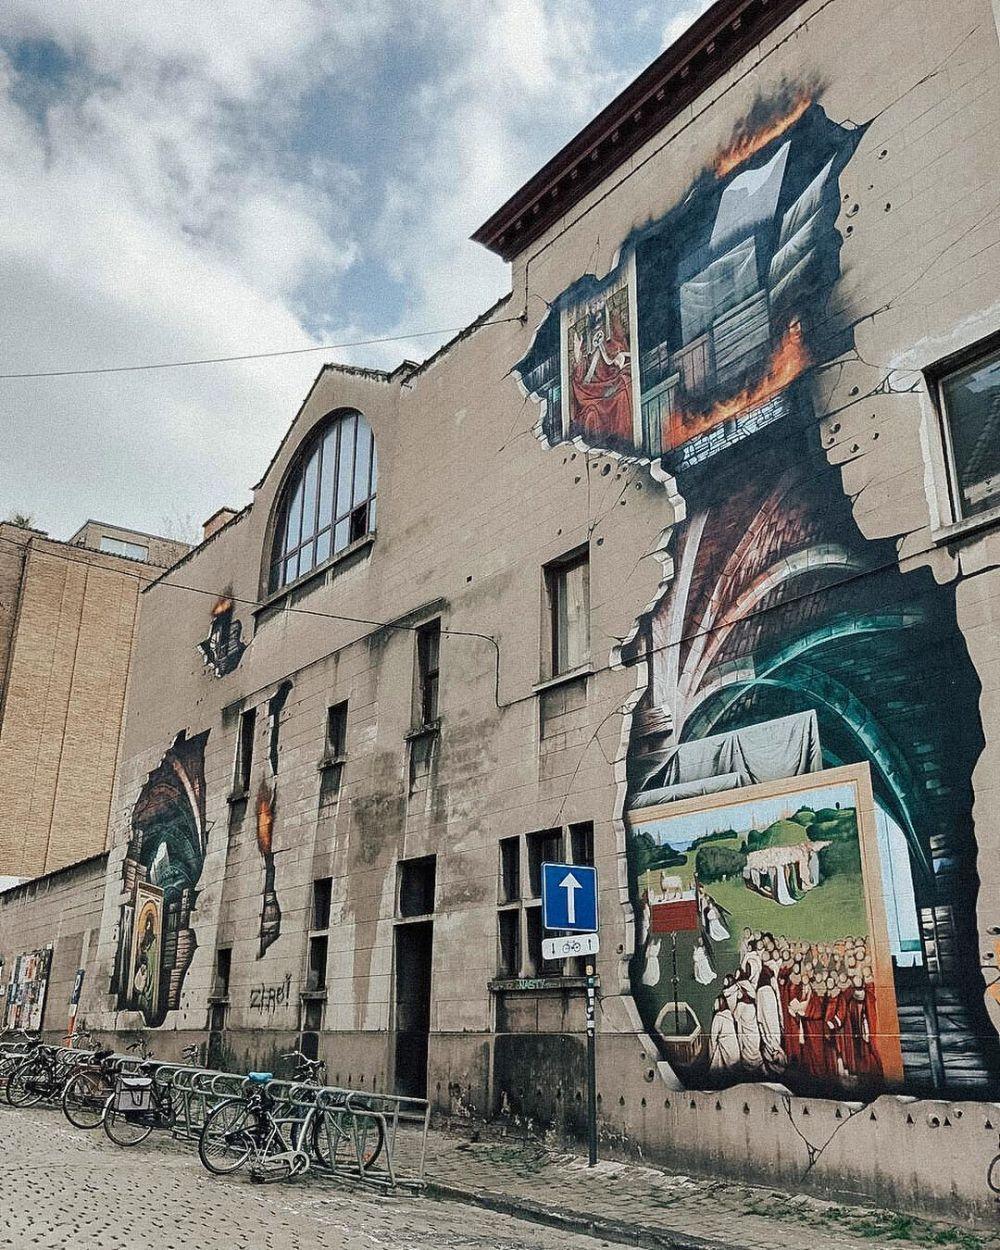 Seni mural di ruang publik  istimewa